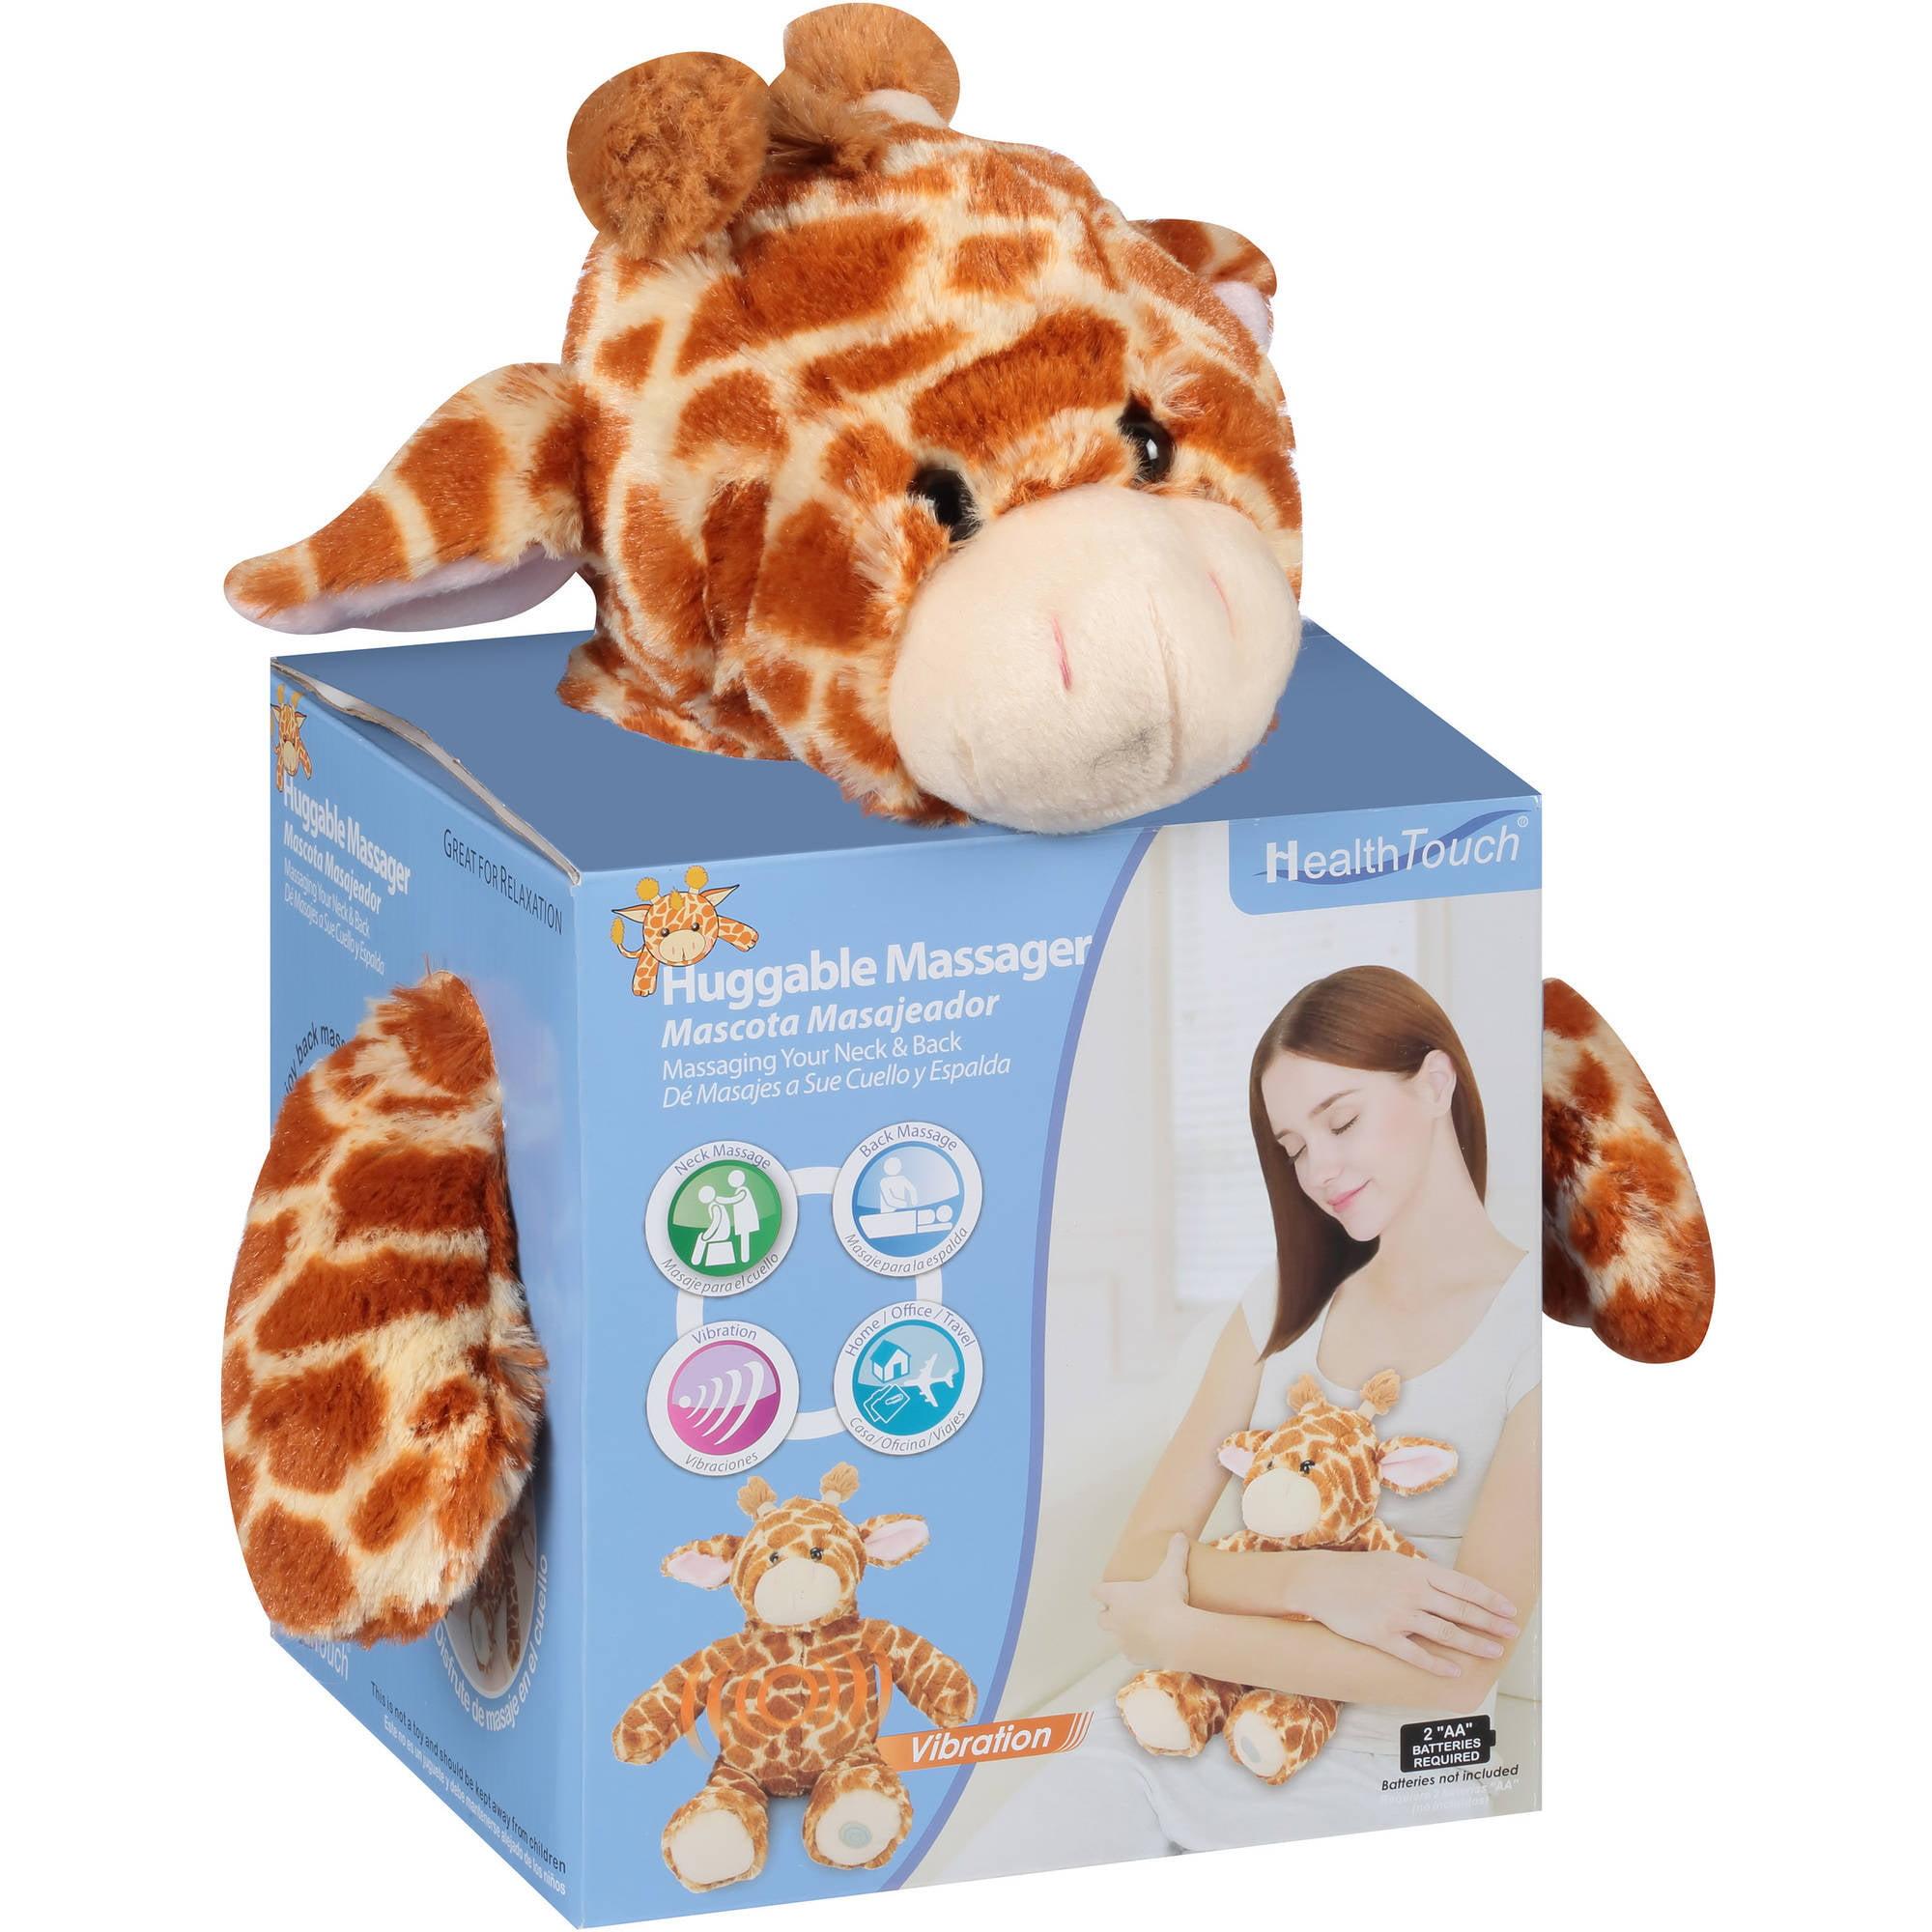 Health Touch Giraffe Huggable Massager